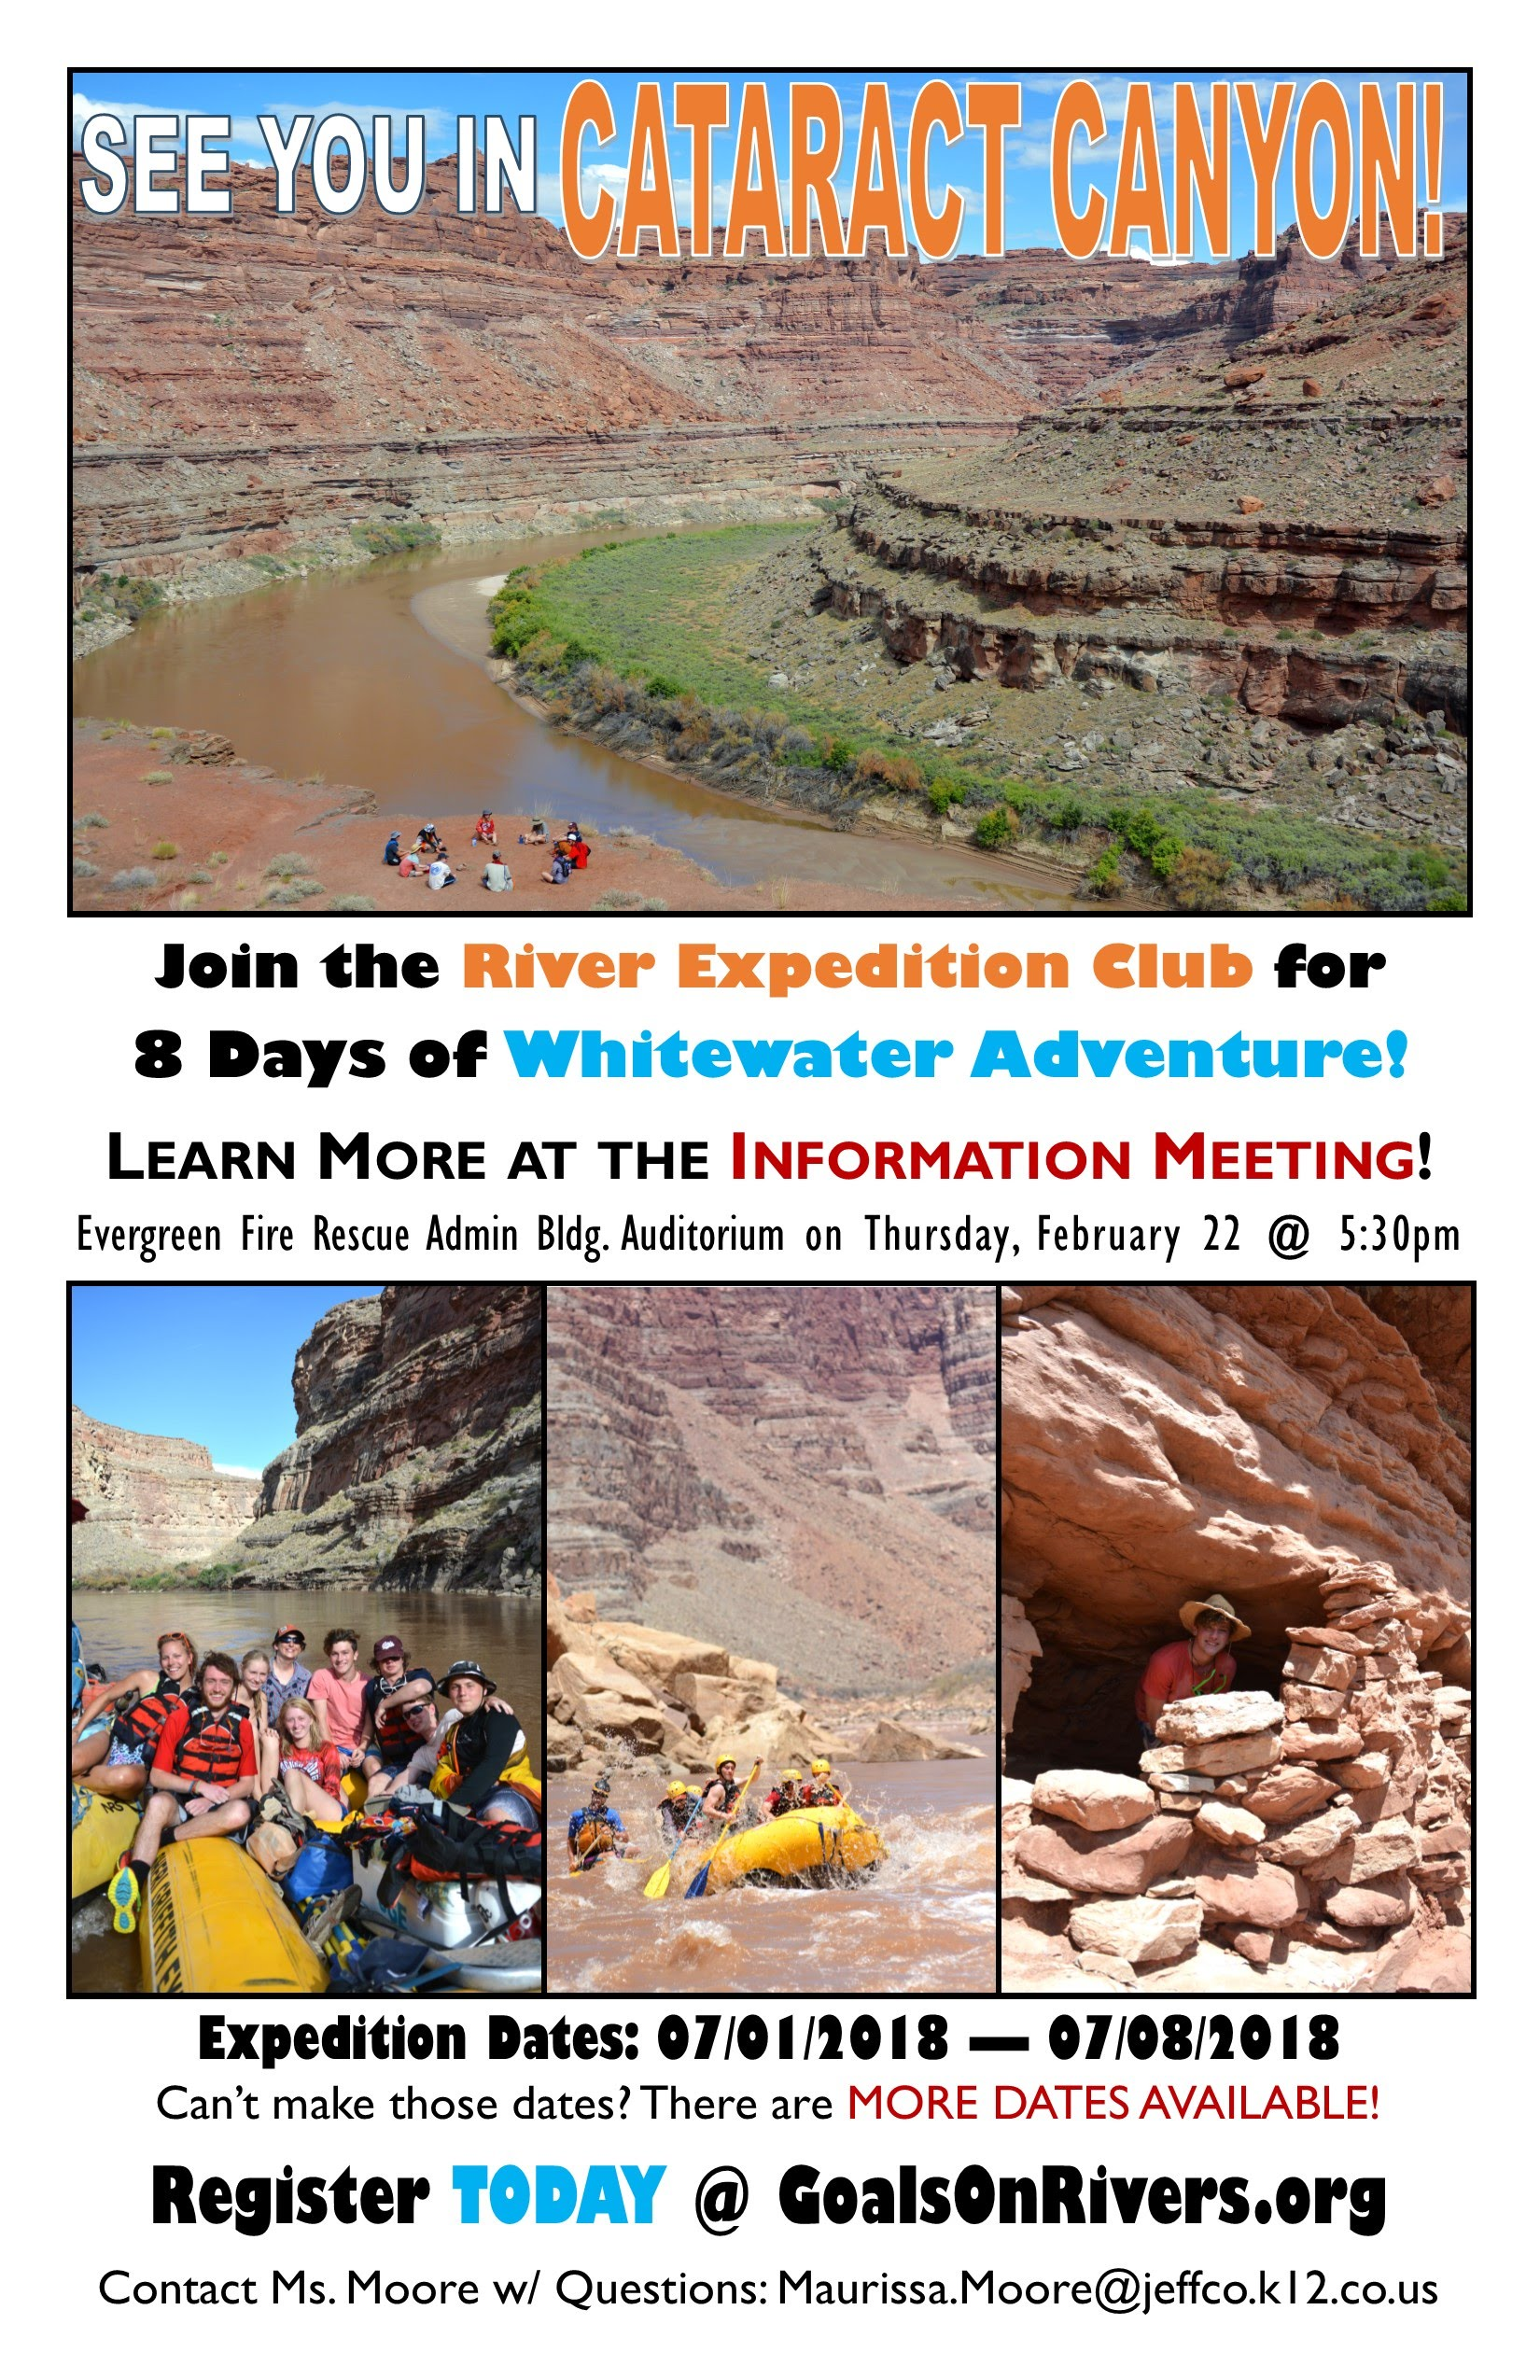 http://www.goalsonrivers.org/class-iii-expeditions/